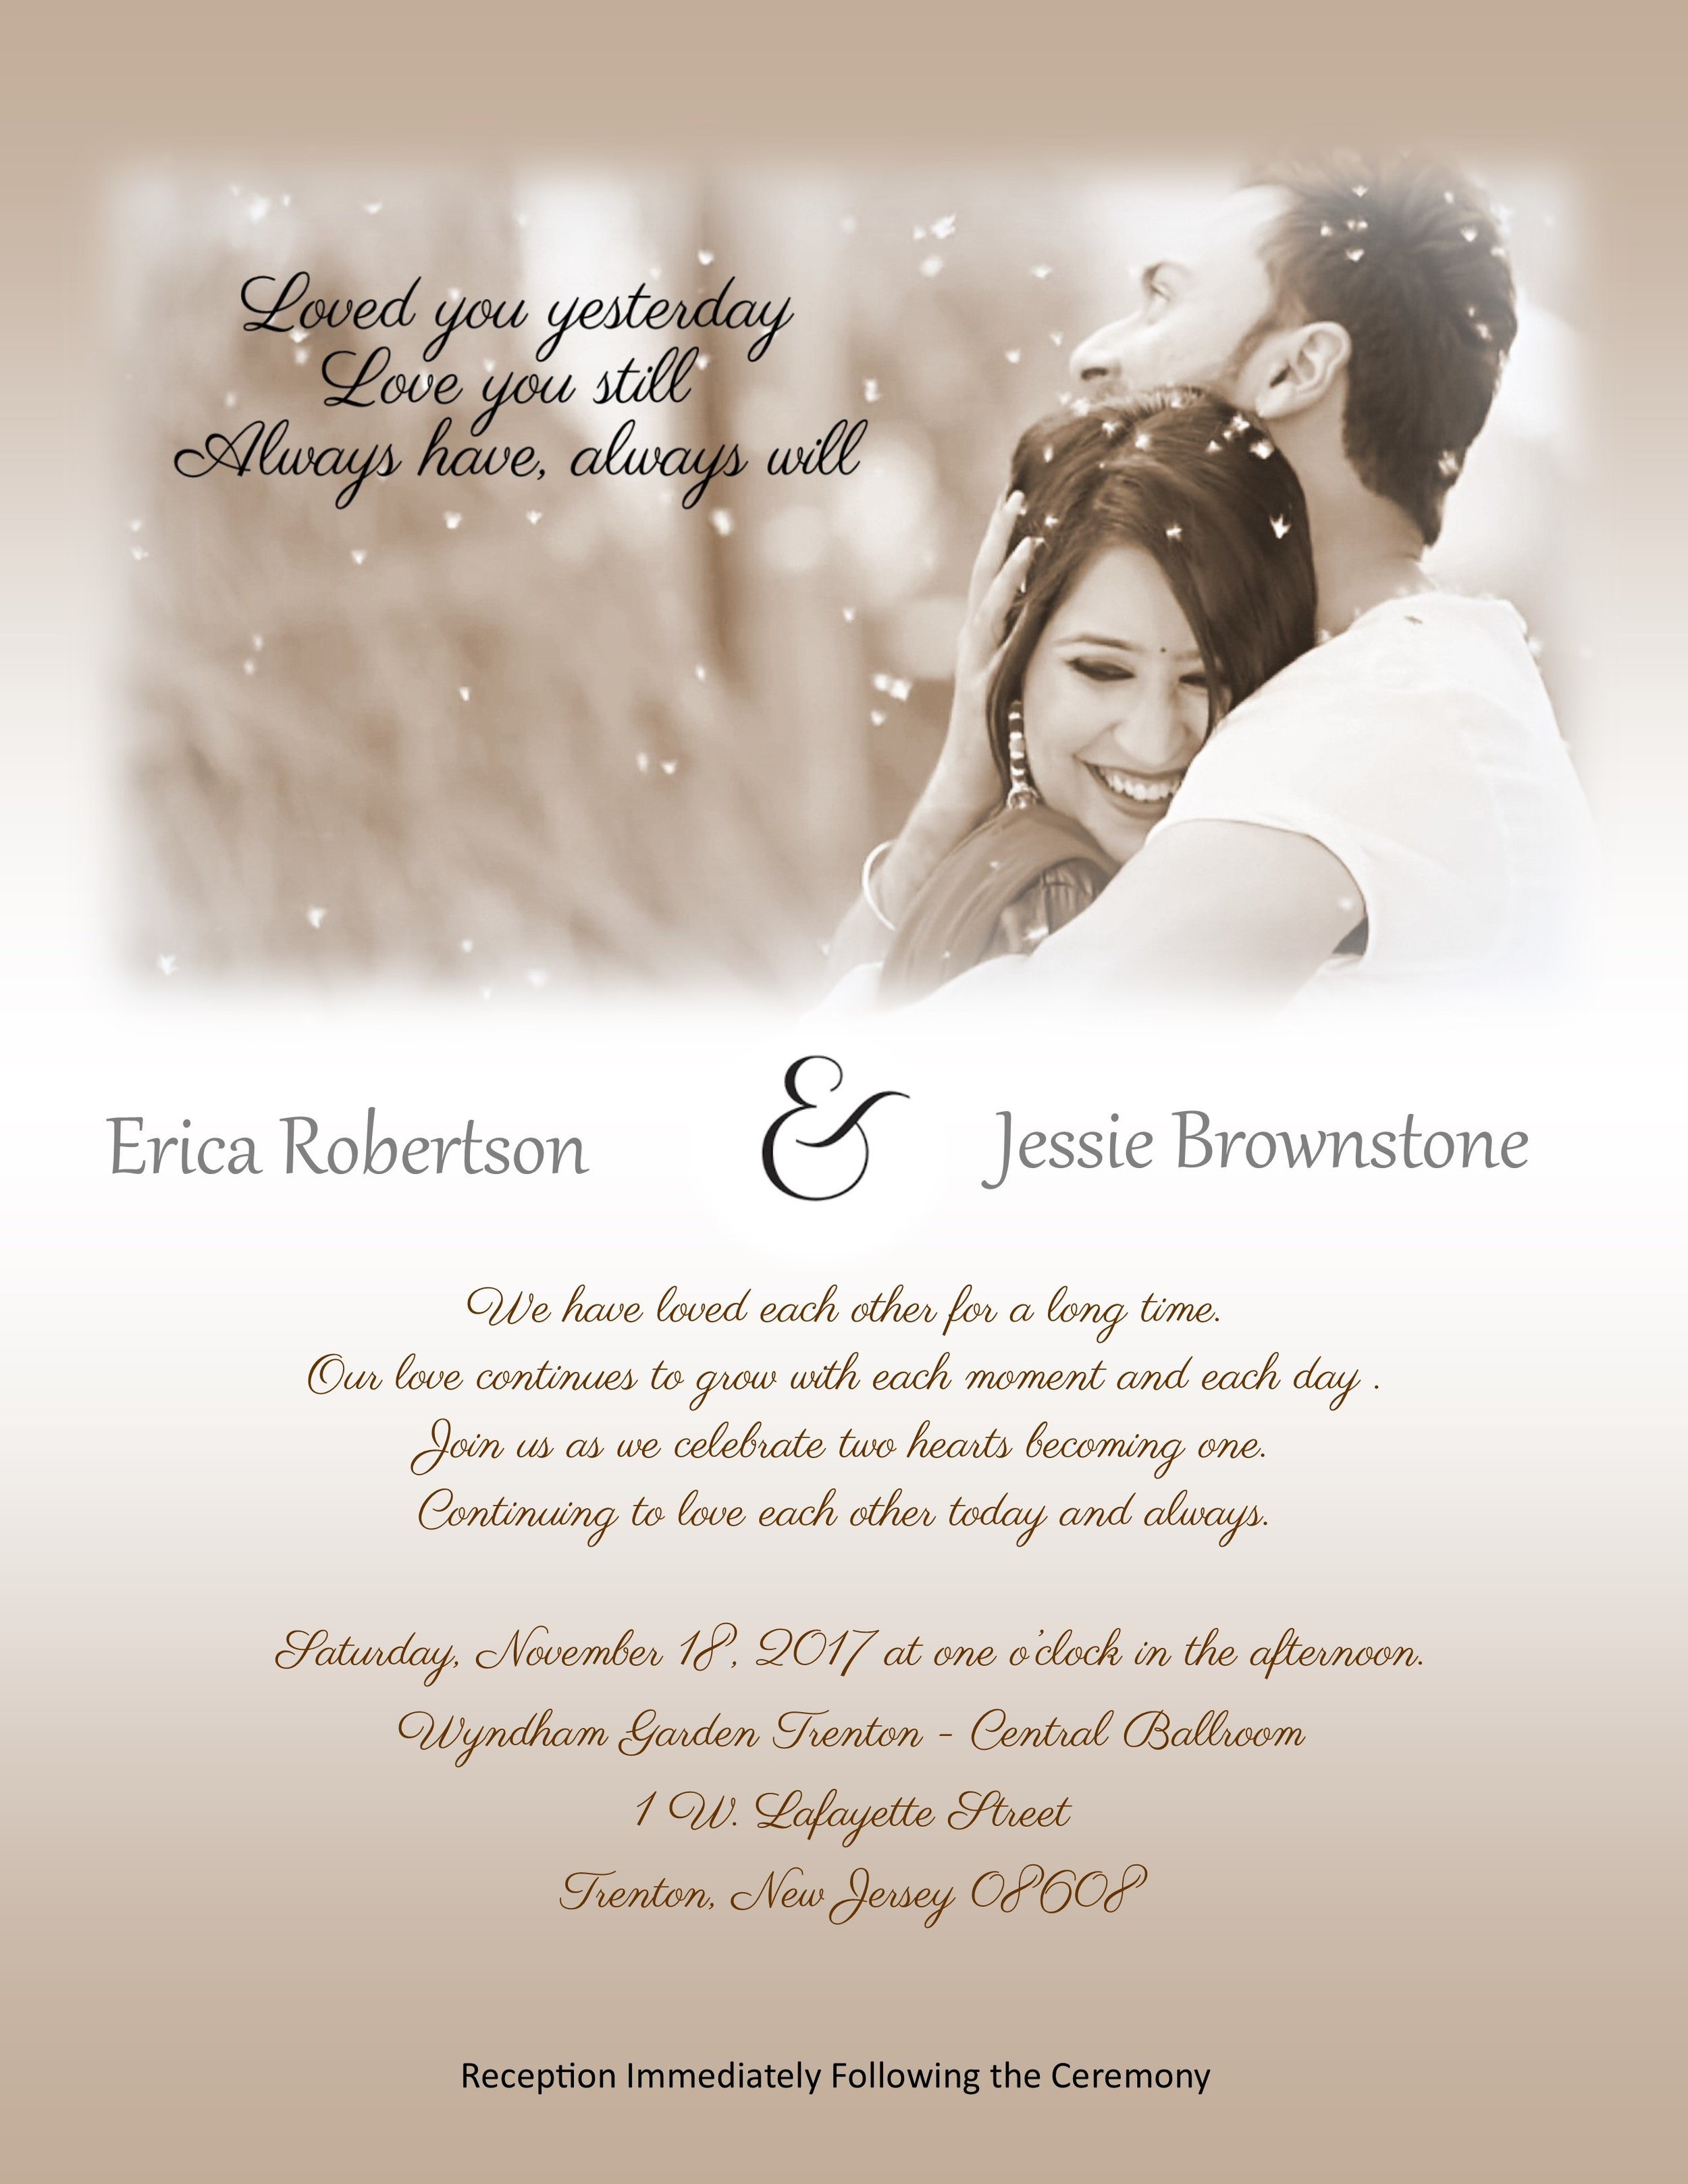 Loving Couple Wedding Invitation.jpg